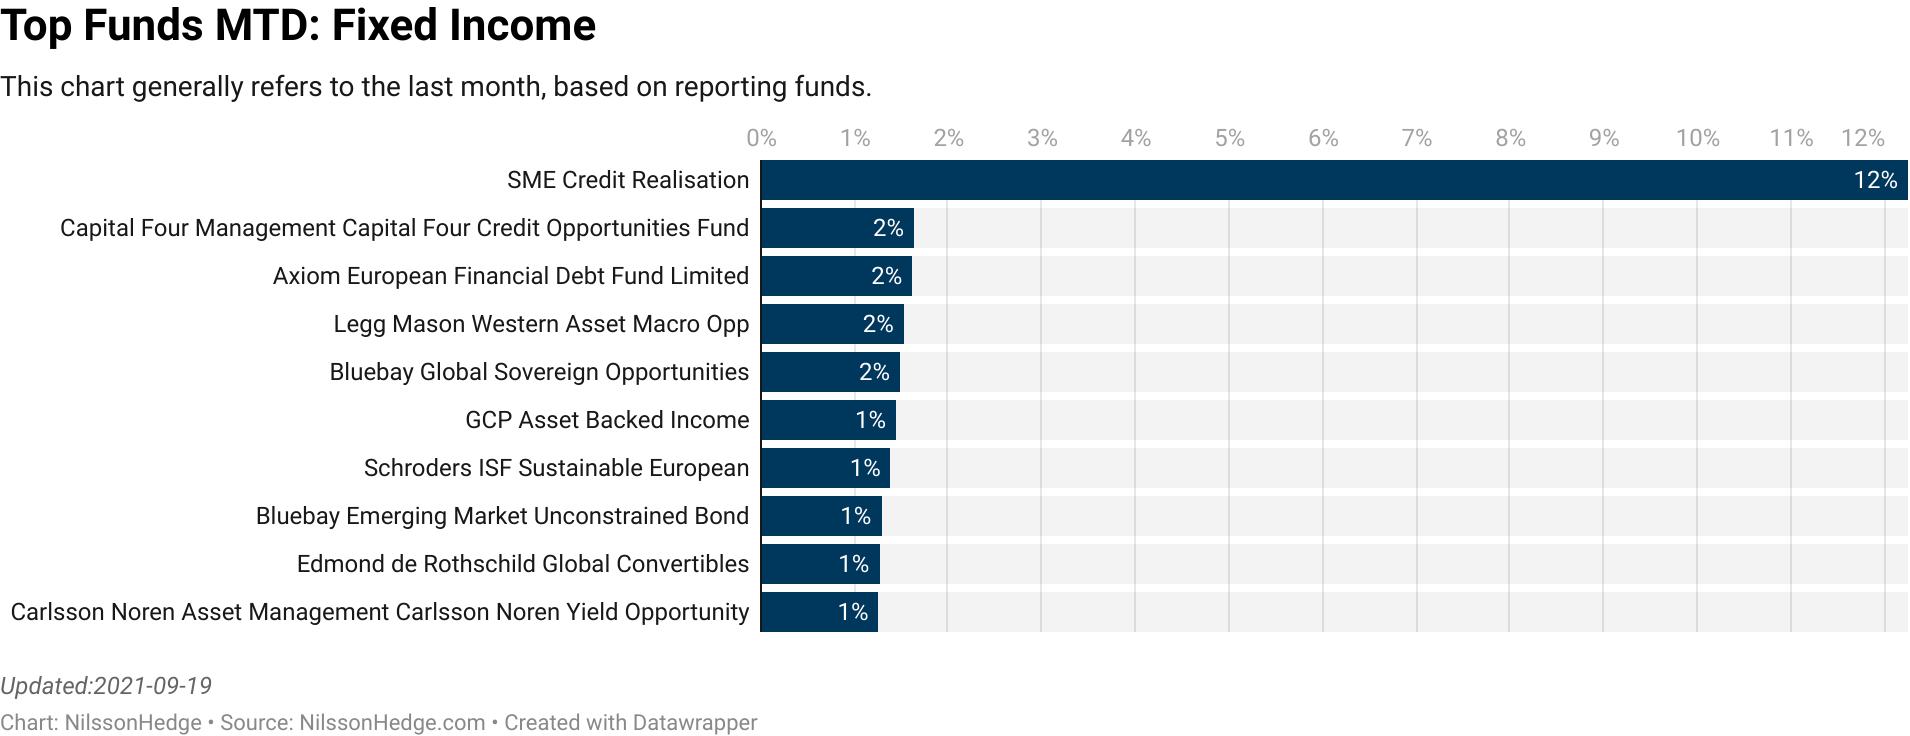 VPC : Specialty Lending Investments  :  5.71% [0.00]  BioPharma : BioPharma Credit  :  3.51% [0.00]  Nykredit Asset Management : Nykredit MIRA Hedge Fund  :  3.42% [73.70]  Formuepleje Fund Management : Formuepleje Fokus  :  3.41% [203.10]  CQS : New City High Yield Fund  :  2.65% [0.00]  GCP : Asset Backed Income  :  2.03% [0.00]  Stadion : Trilogy Alternative Return  :  1.69% [0.00]  Carlsson Noren Asset Management : Carlsson Noren Yield Opportunity  :  1.57% [26.60]  Highbridge : Credit Fund  :  1.52% [0.00]  Nykredit Asset Management : Nykredit EVIRA Hedge Fund  :  1.15% [54.30]